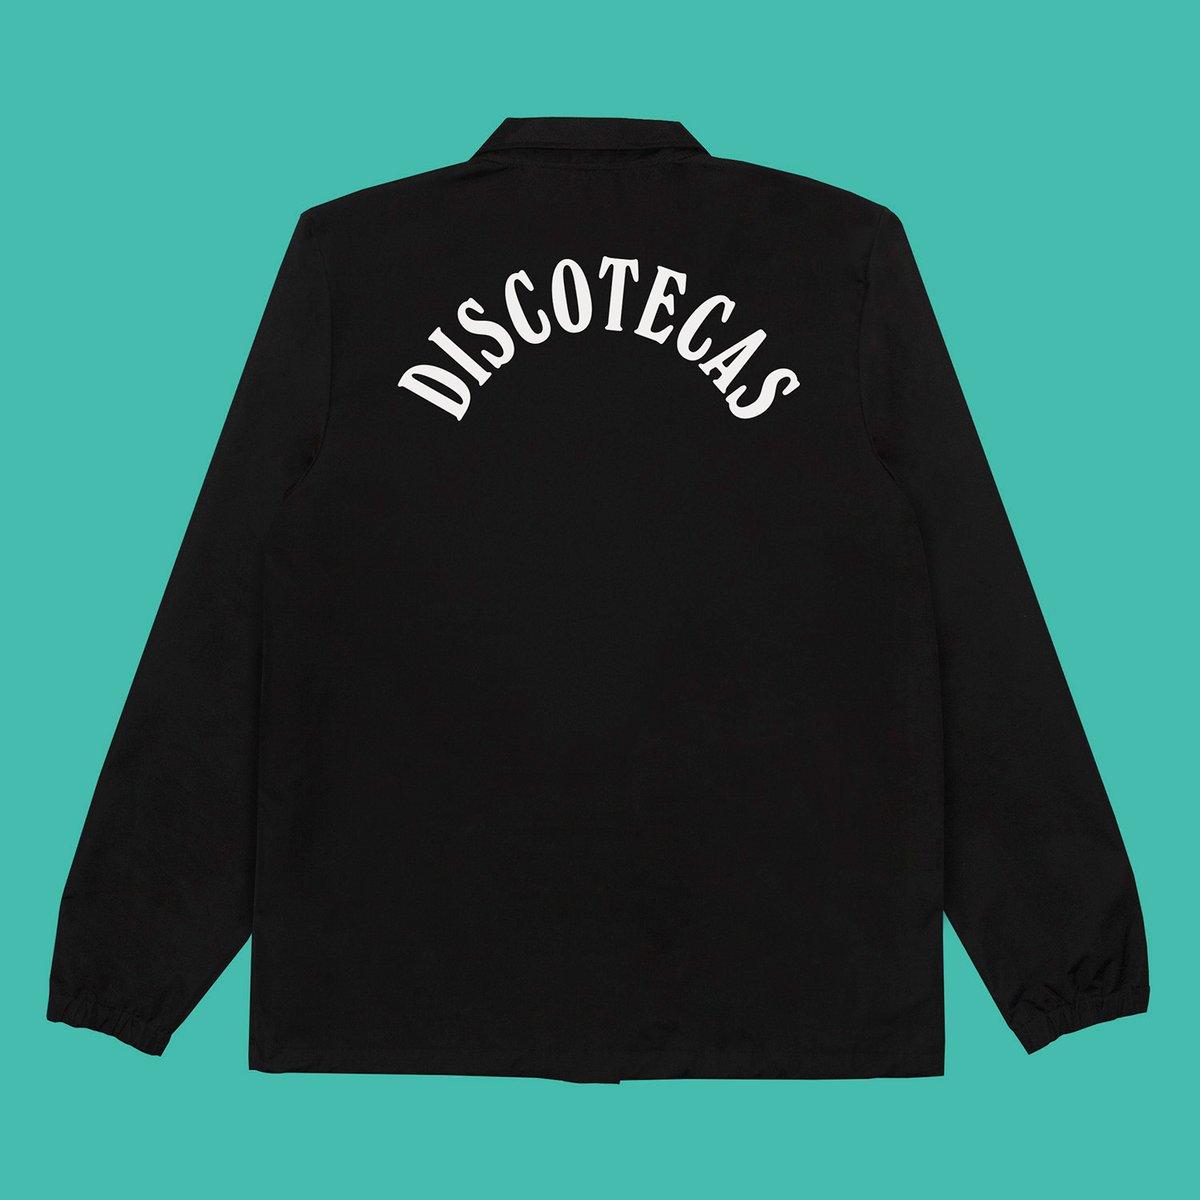 Image of Discotecas Coaches Jacket